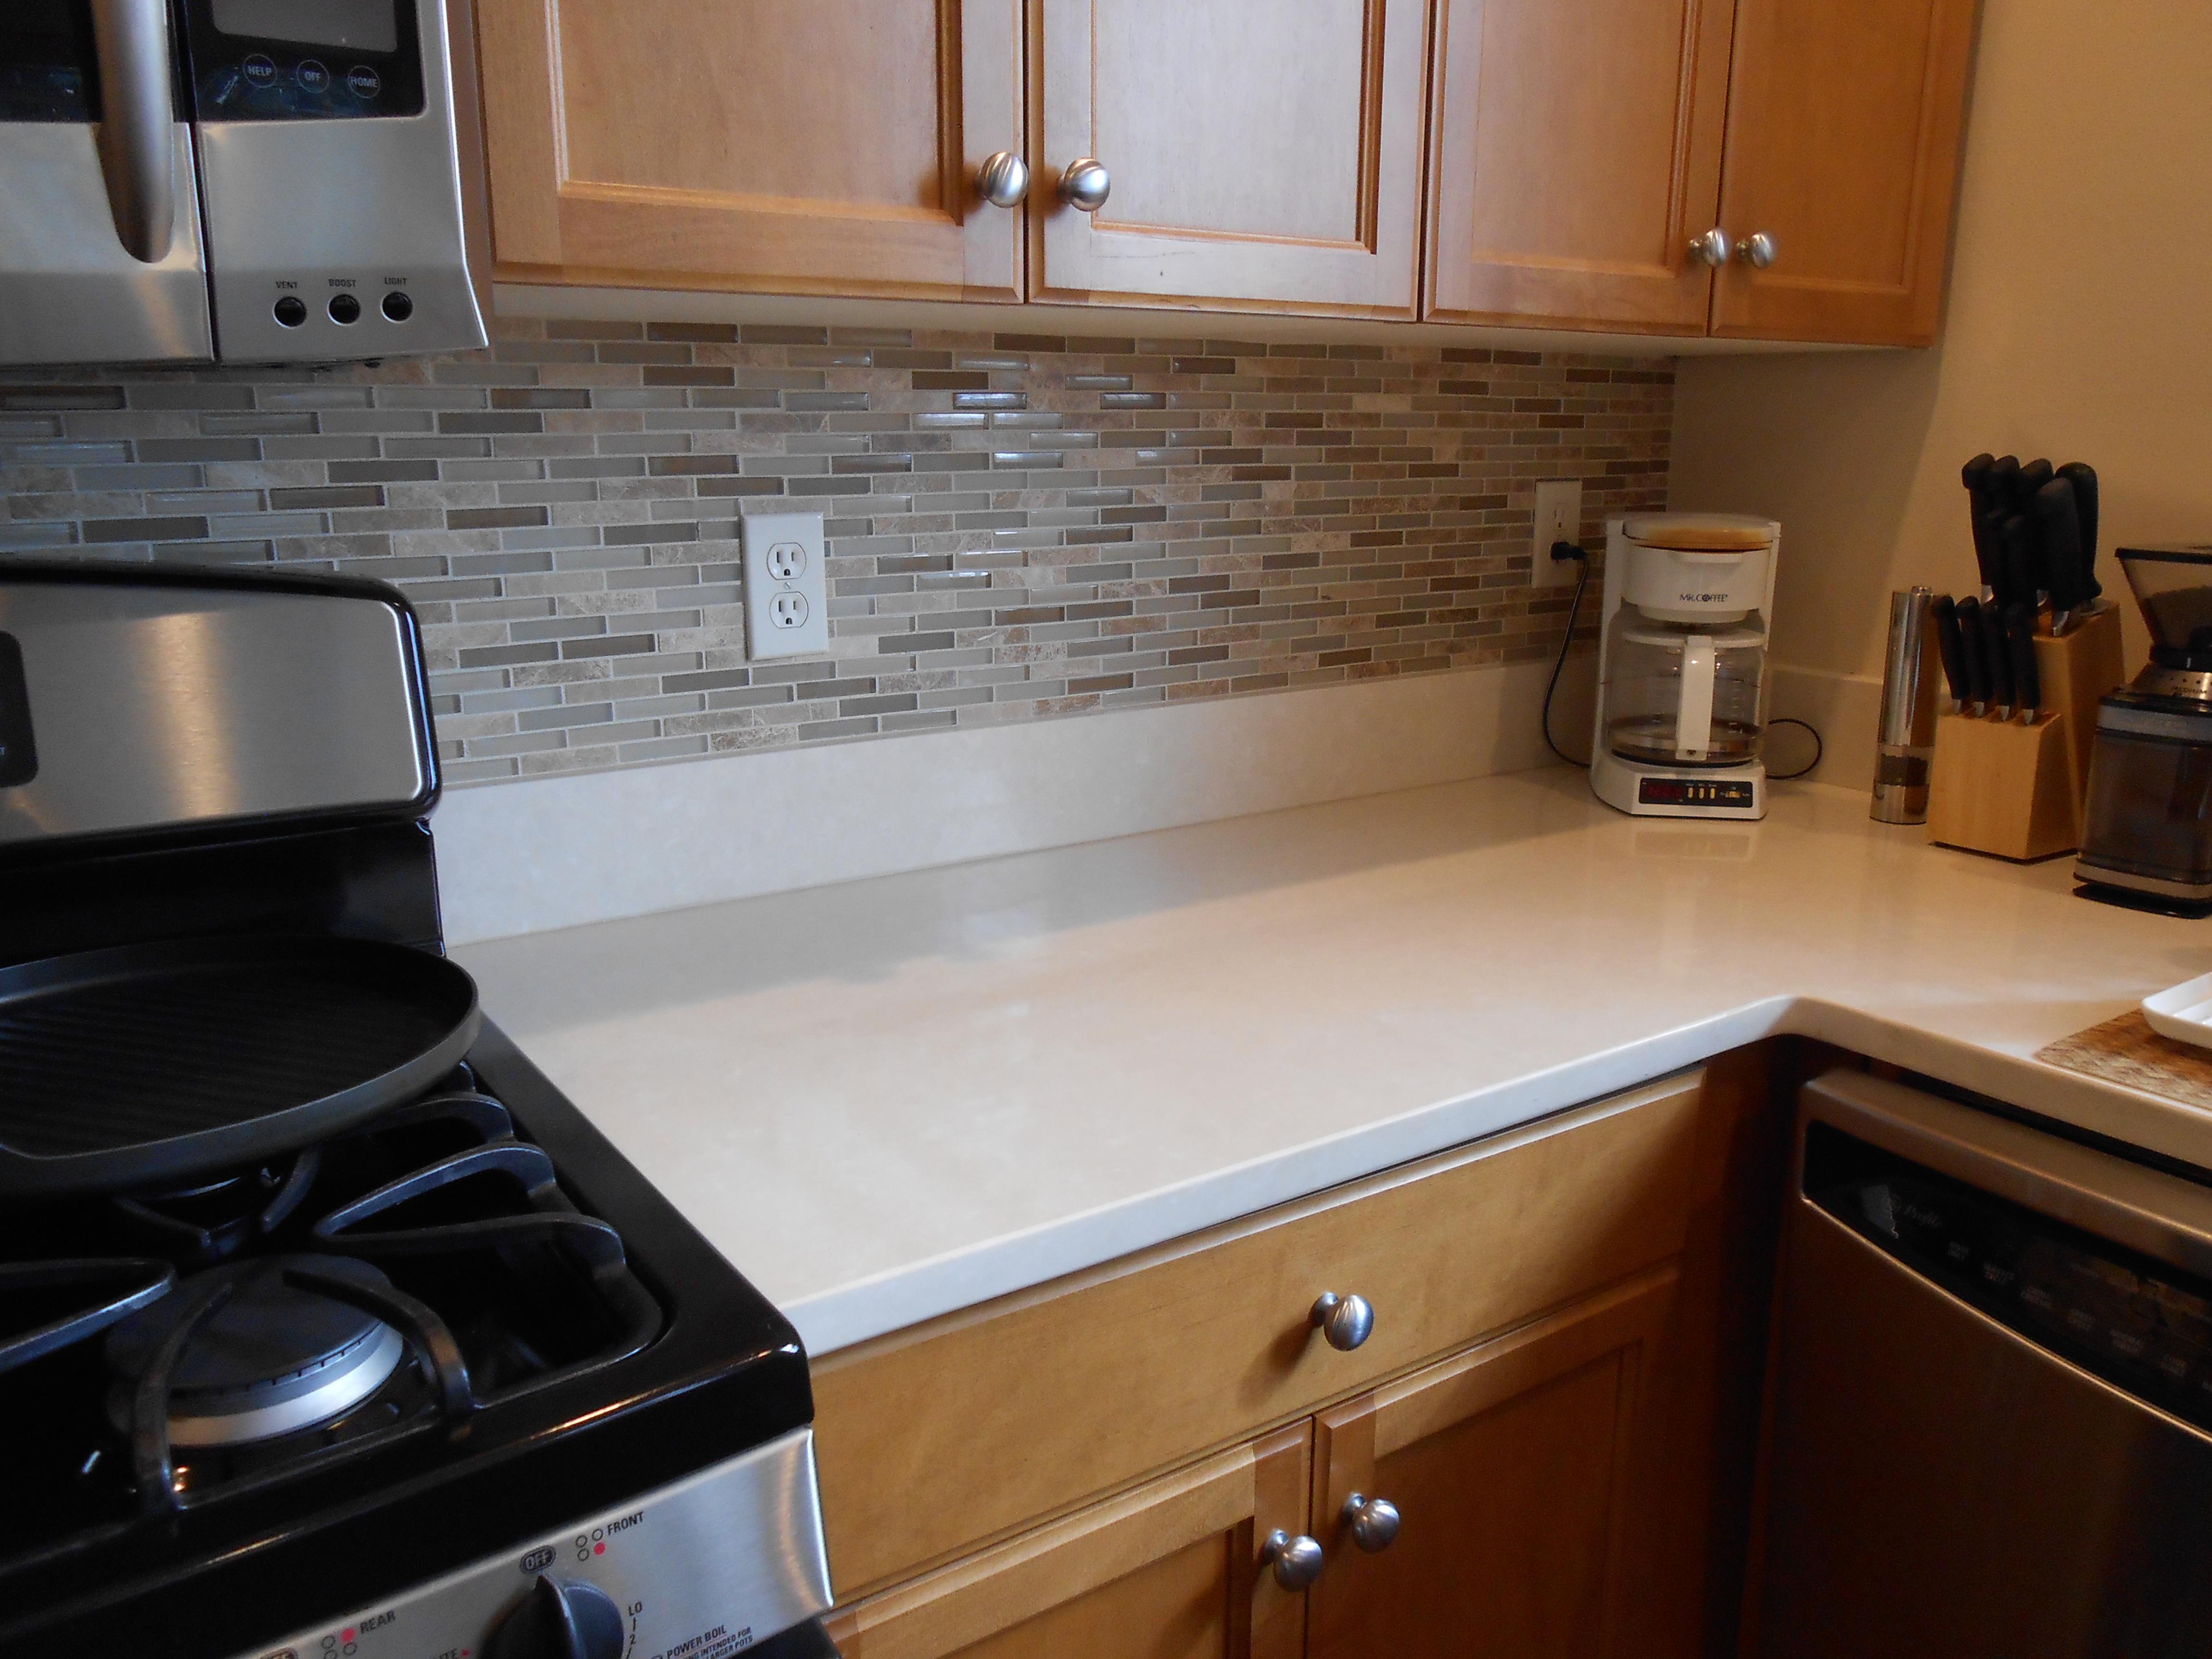 quartz slab countertop and glass tile backsplash